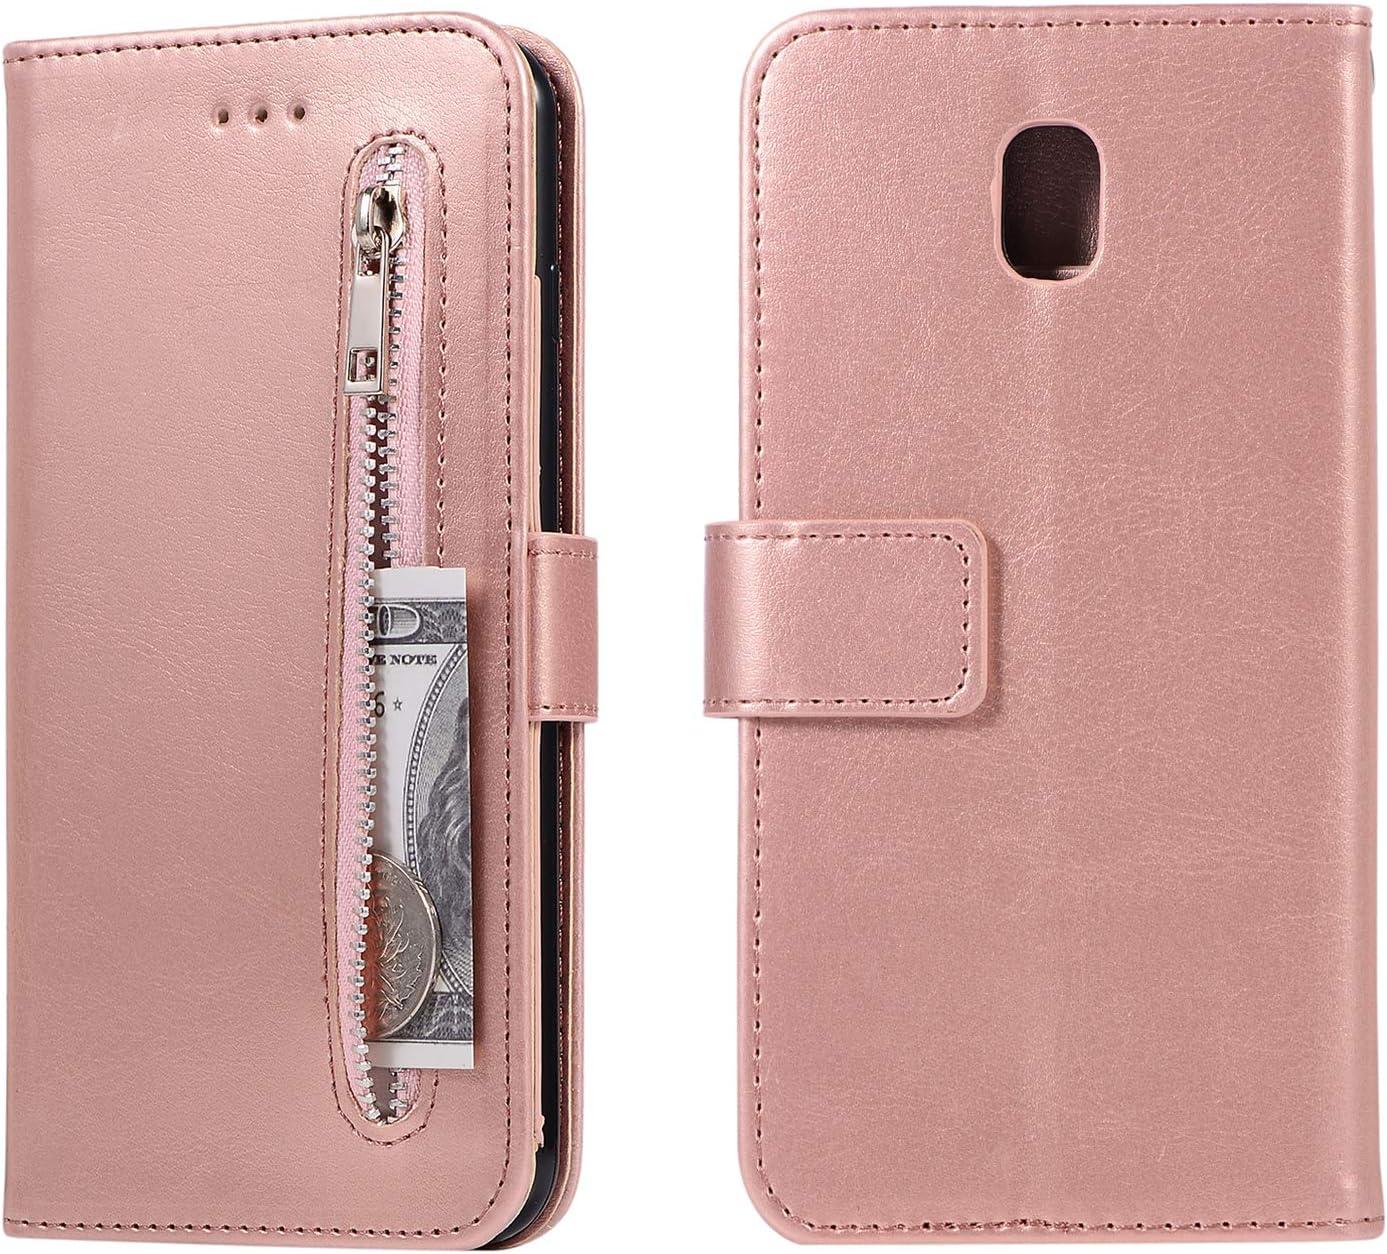 HUDDU Handyh/ülle Kompatibel mit Samsung Galaxy J5 2017 J530 H/ülle Leder Wallet Schutzh/ülle 5 Kartenf/ächer Rei/ßverschluss Brieftasche Magnetverschluss Tasche PU Case St/änder Lederh/ülle Wristlet Rot